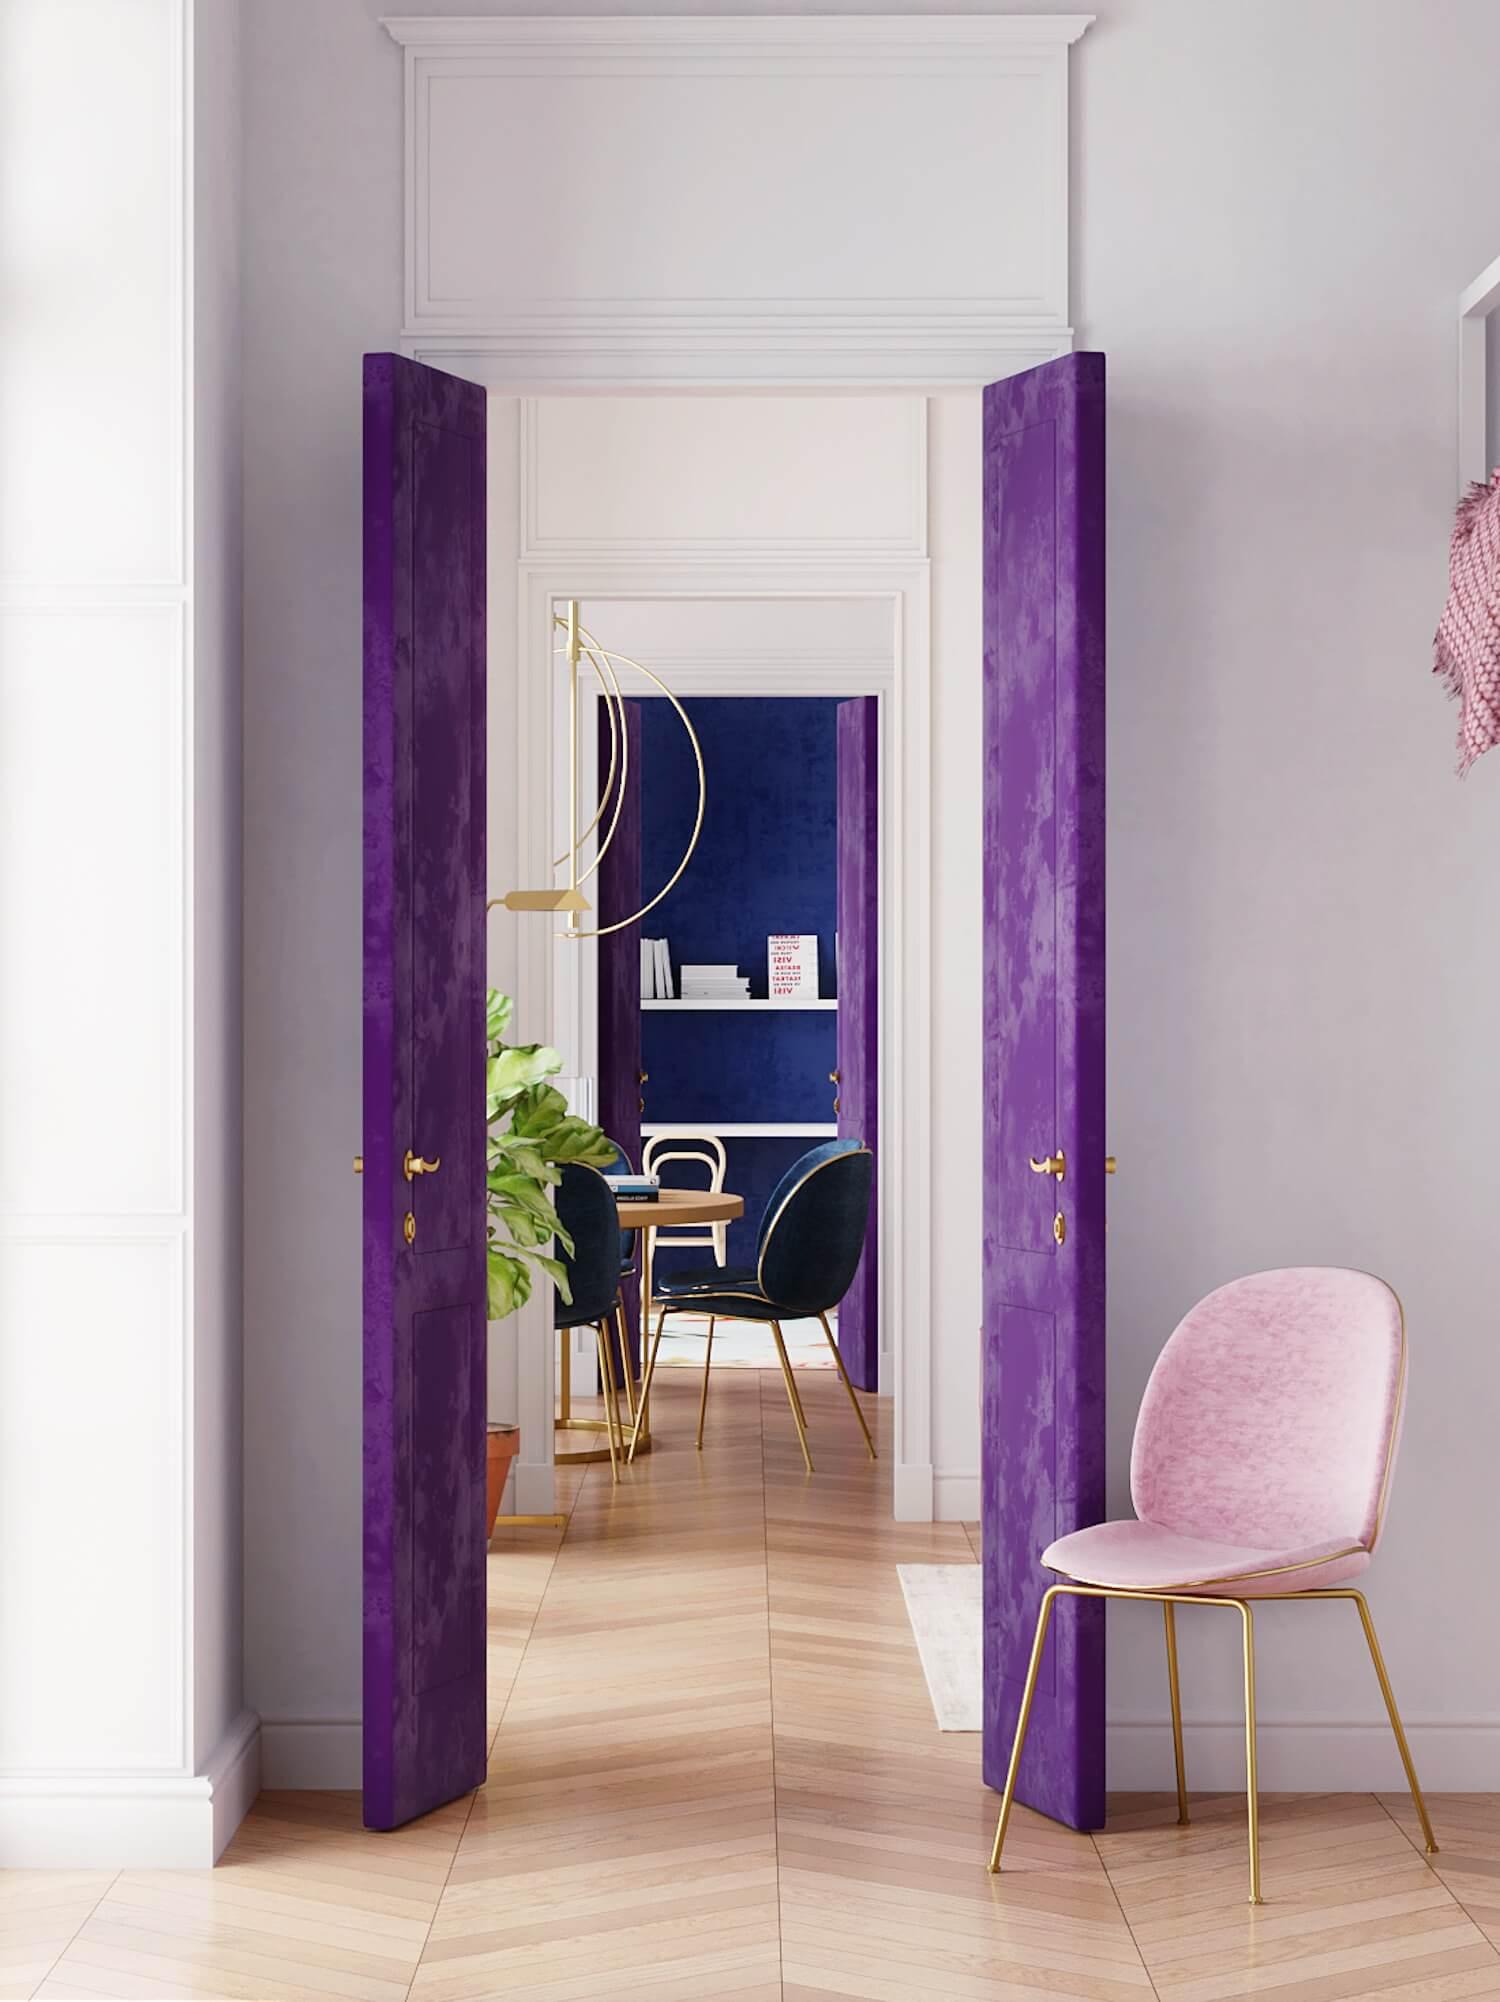 est living parisian apartment crosby studio 2